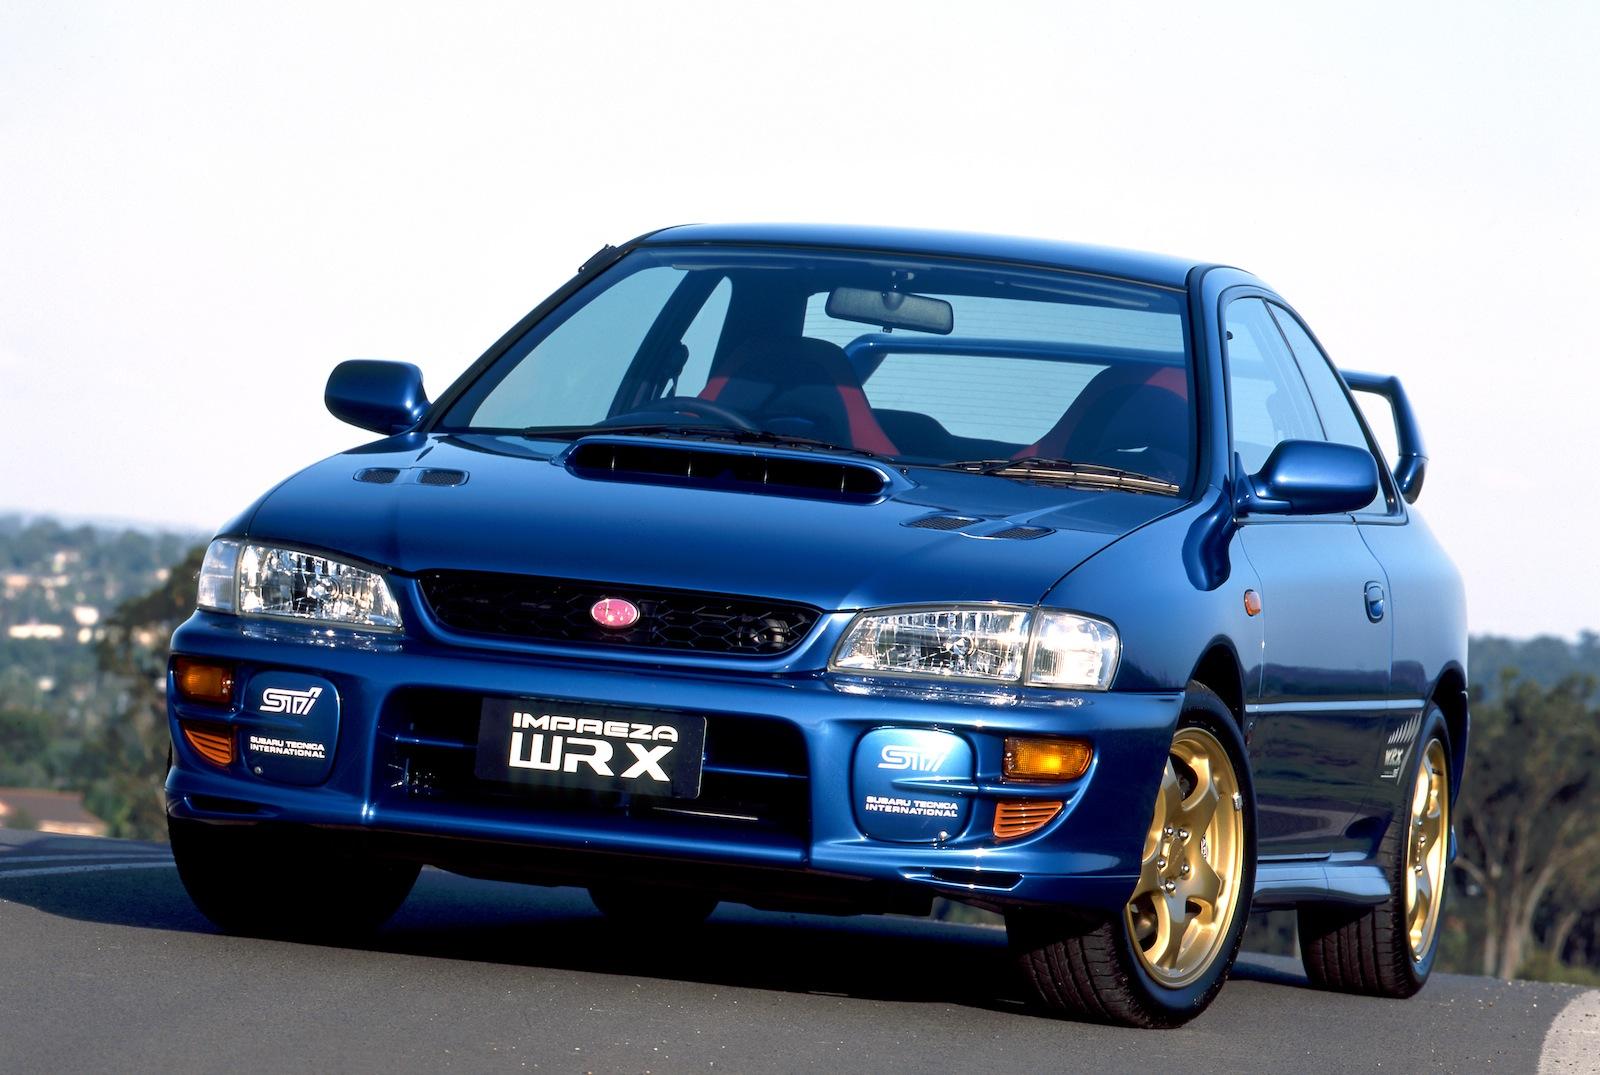 Subaru Wrx Next Generation One For The Fans Photos 1